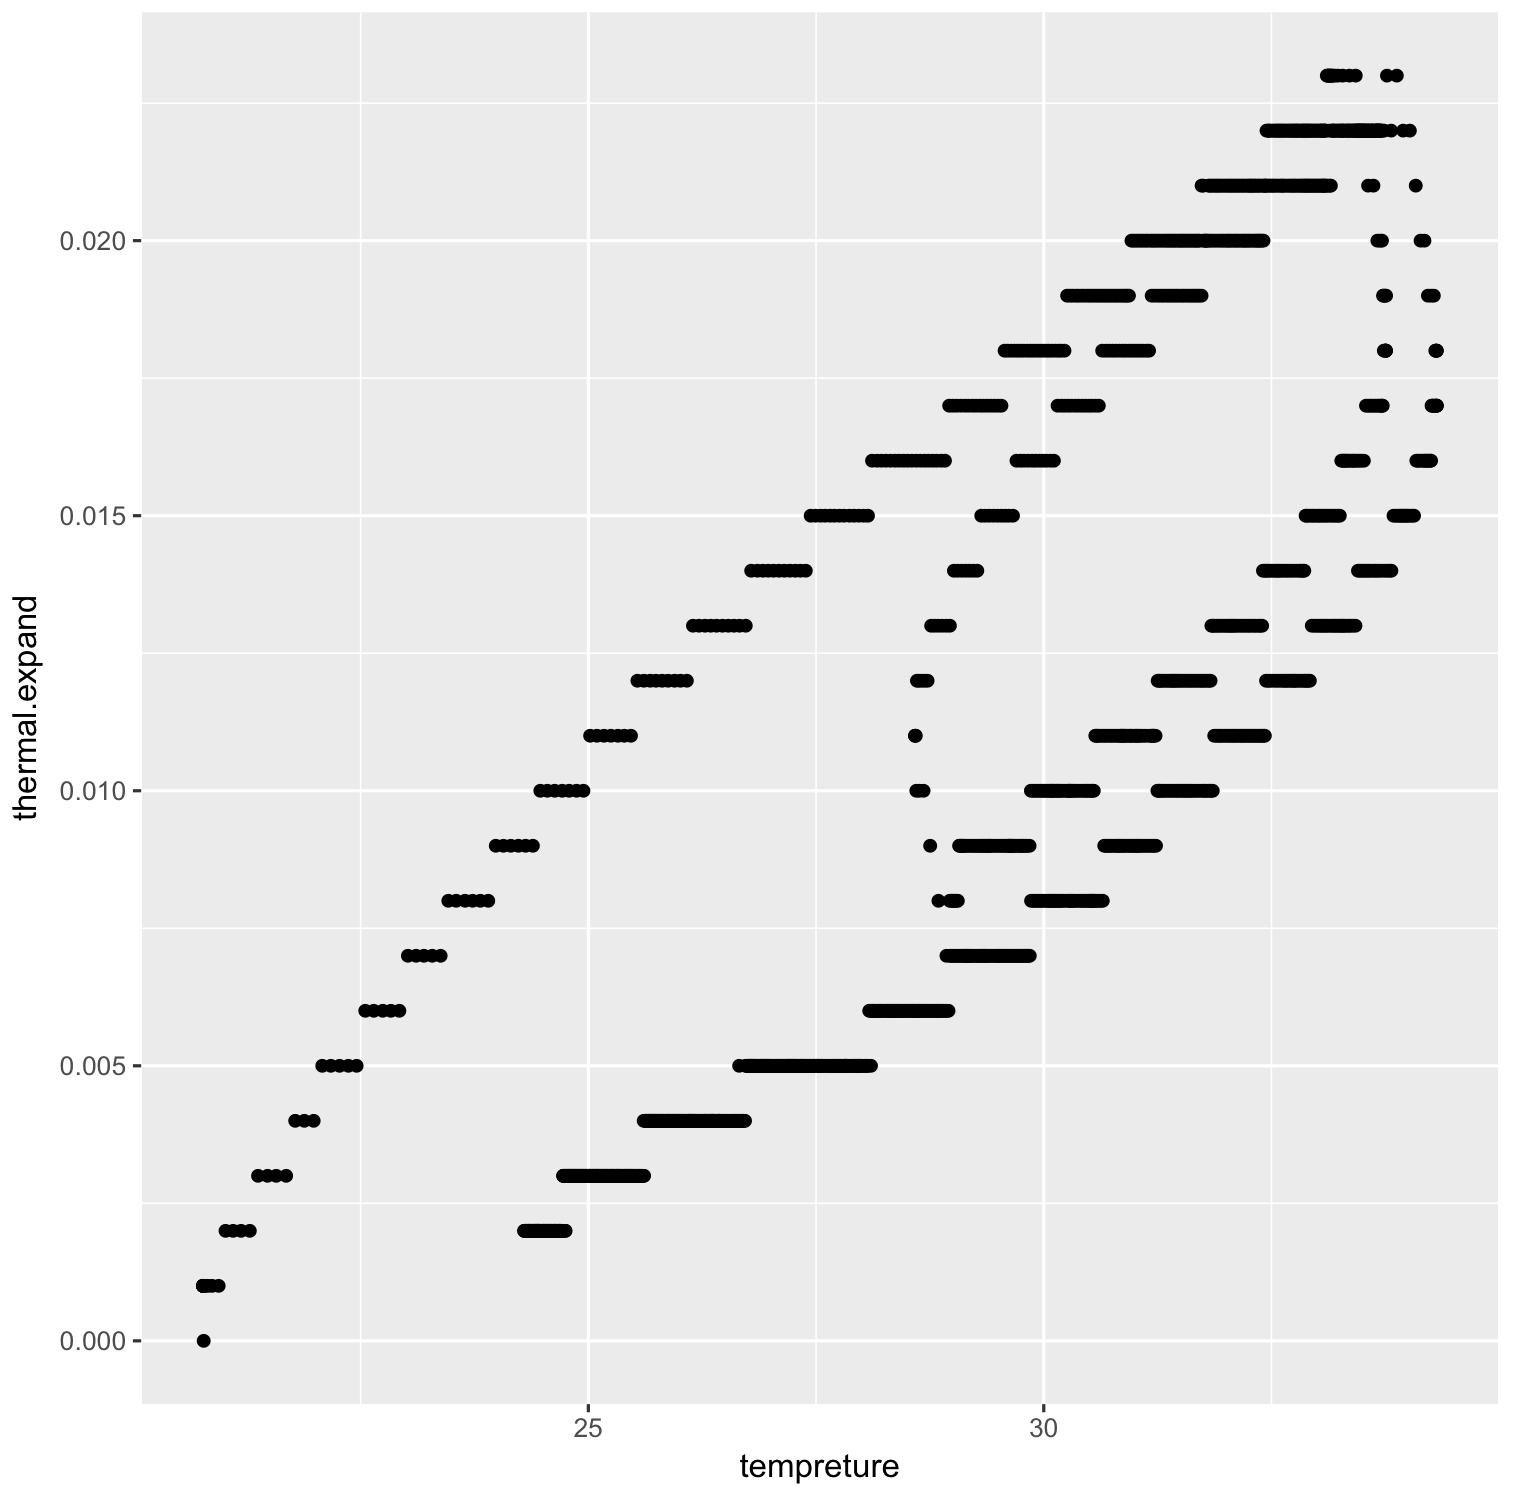 linear regression optimization — RapidMiner Community